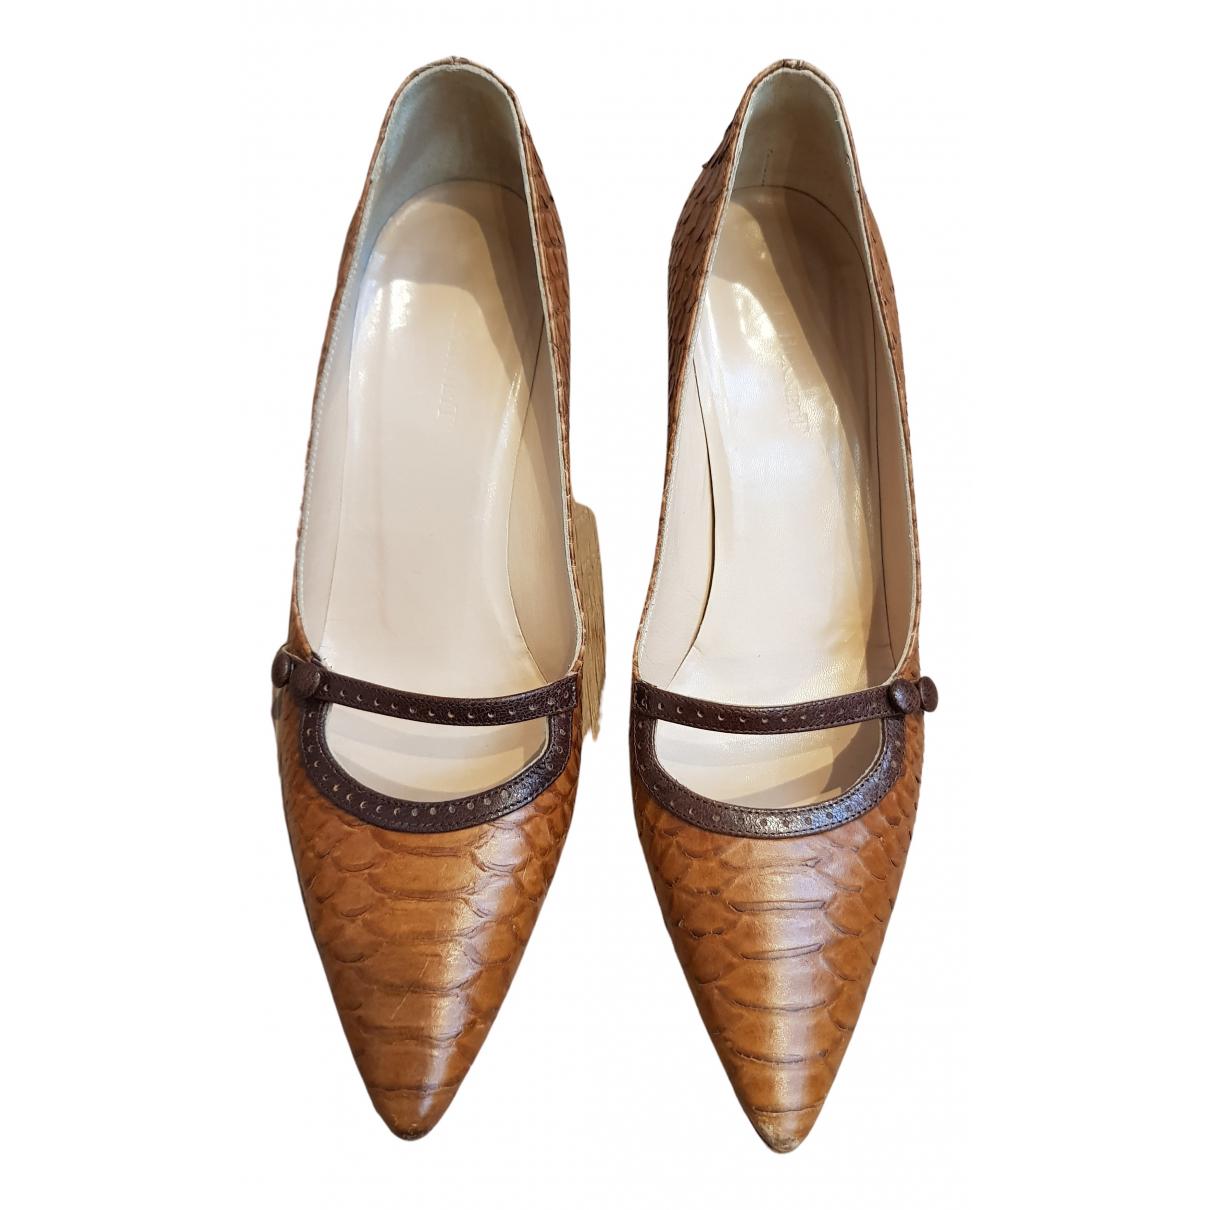 Lk Bennett N Brown Leather Heels for Women 37 EU